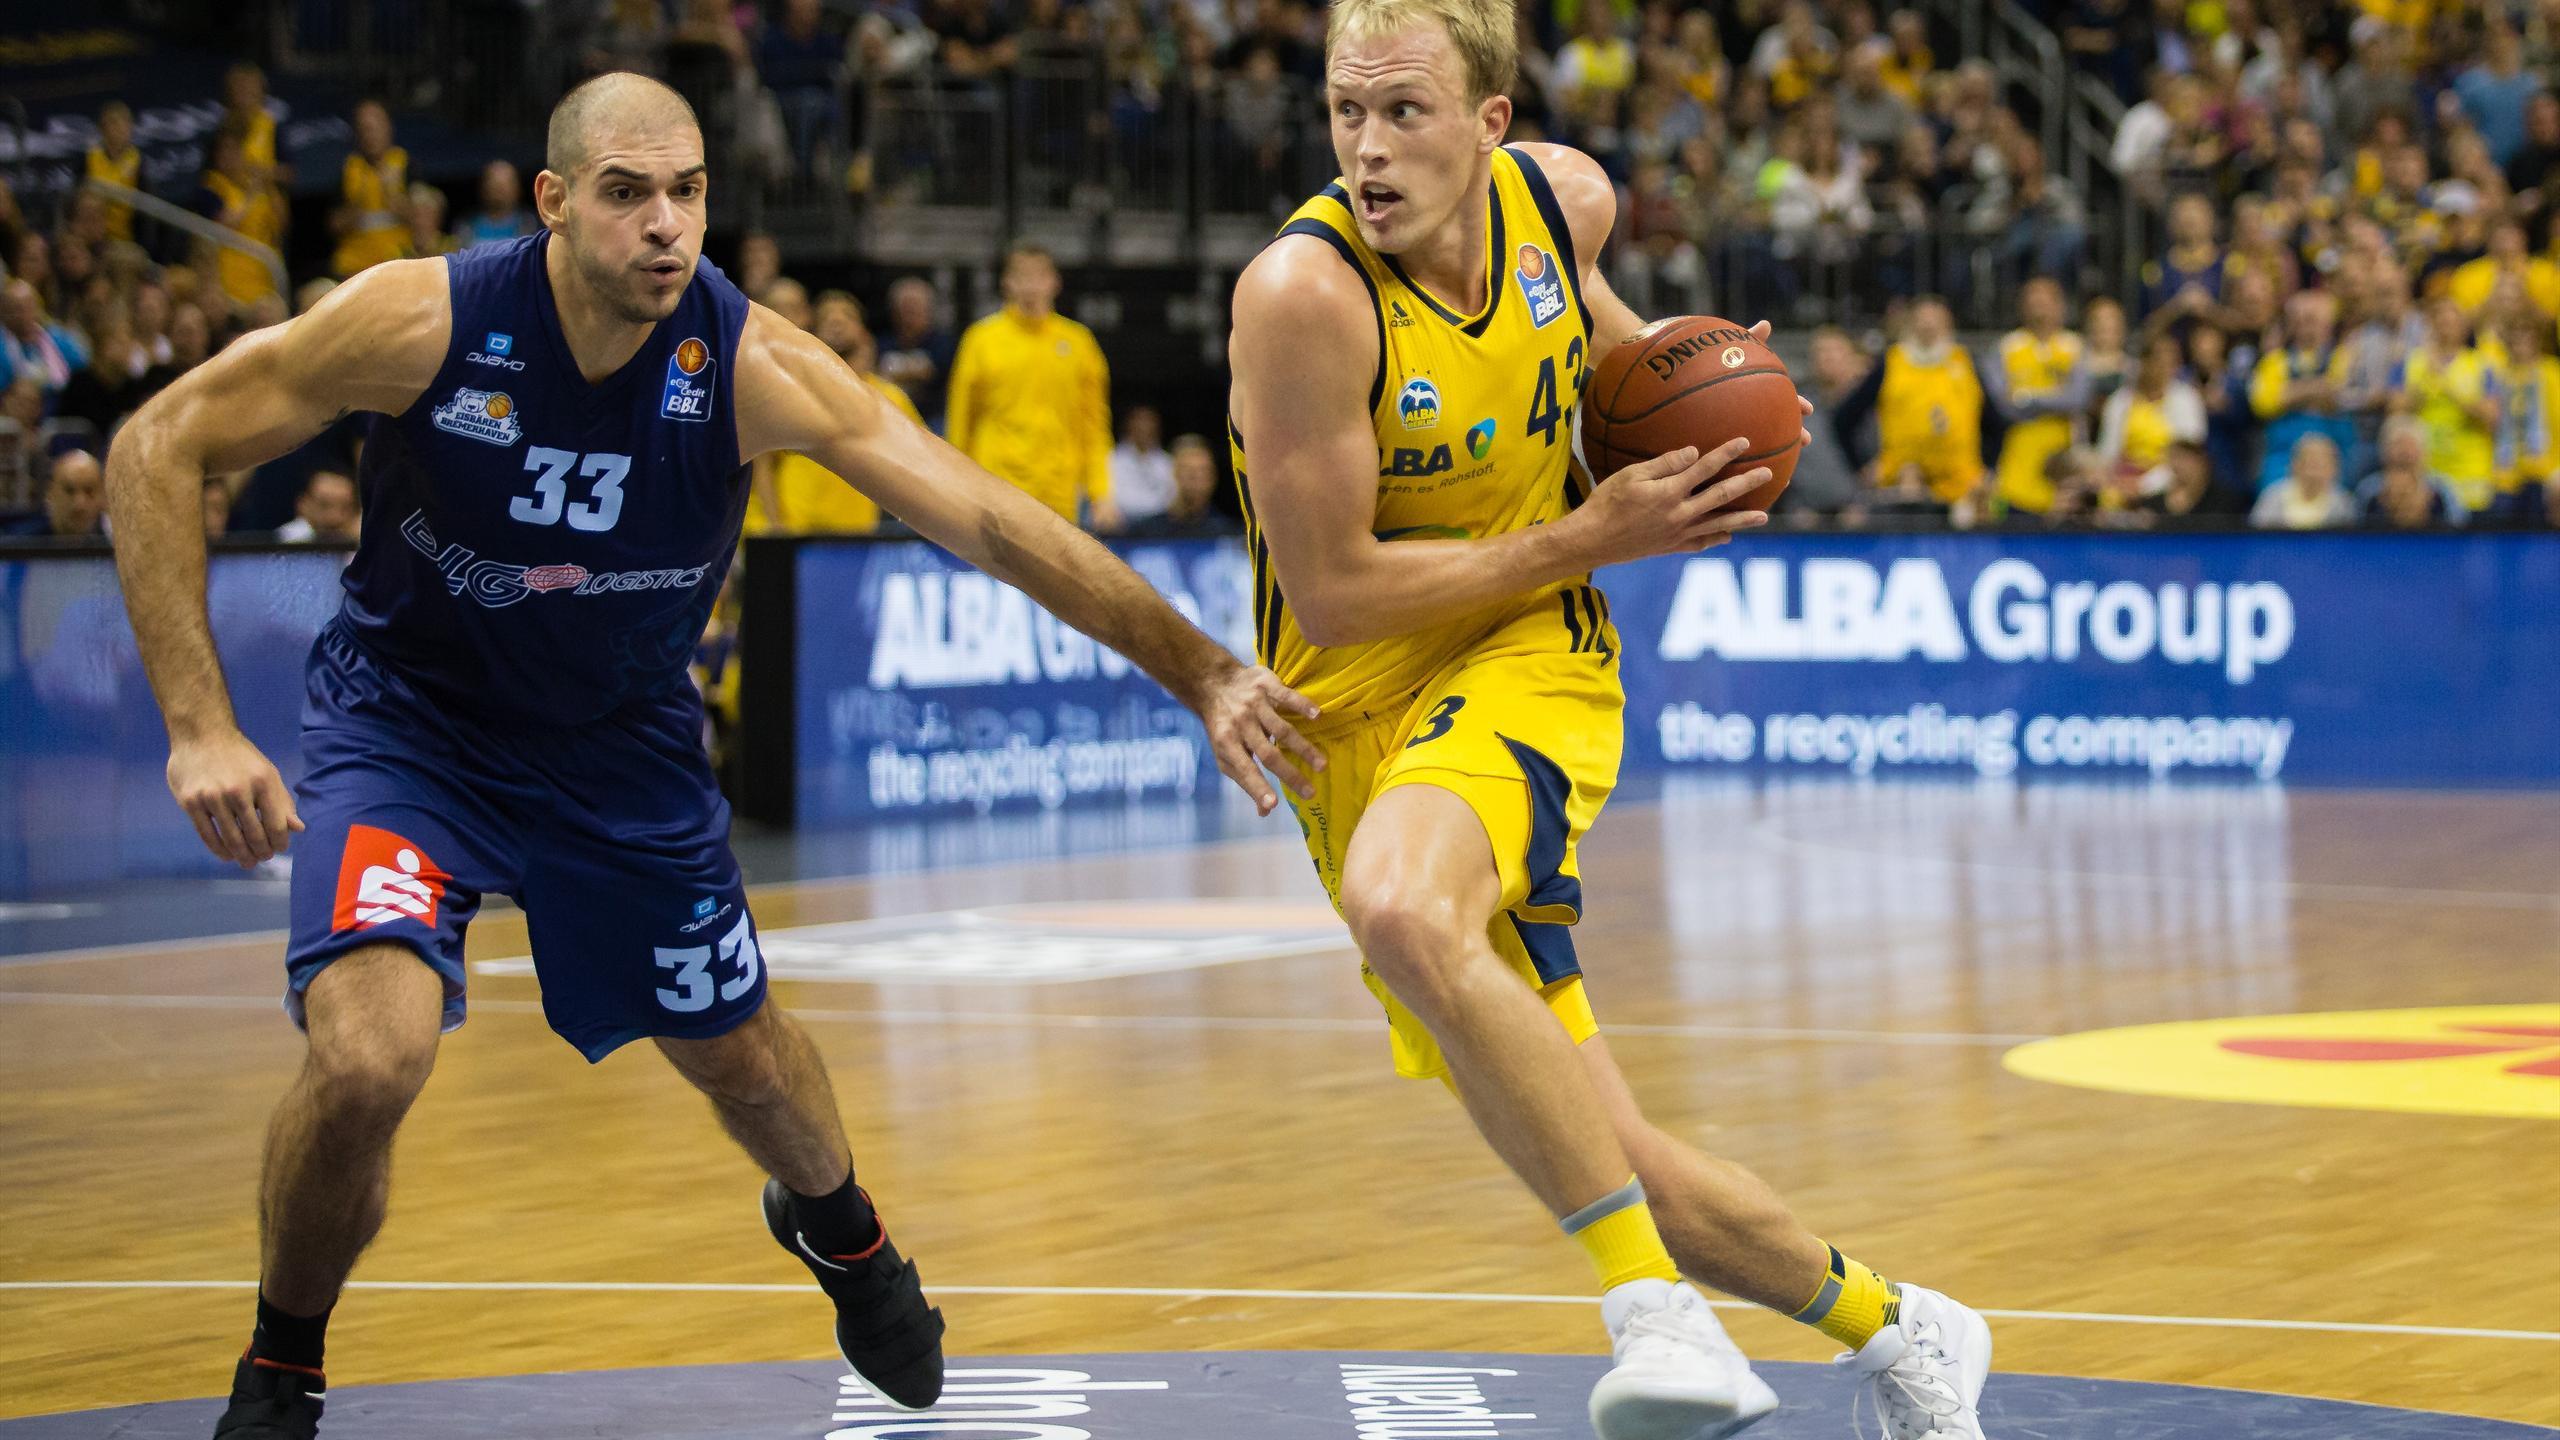 Basketball Ludwigsburg Spielplan